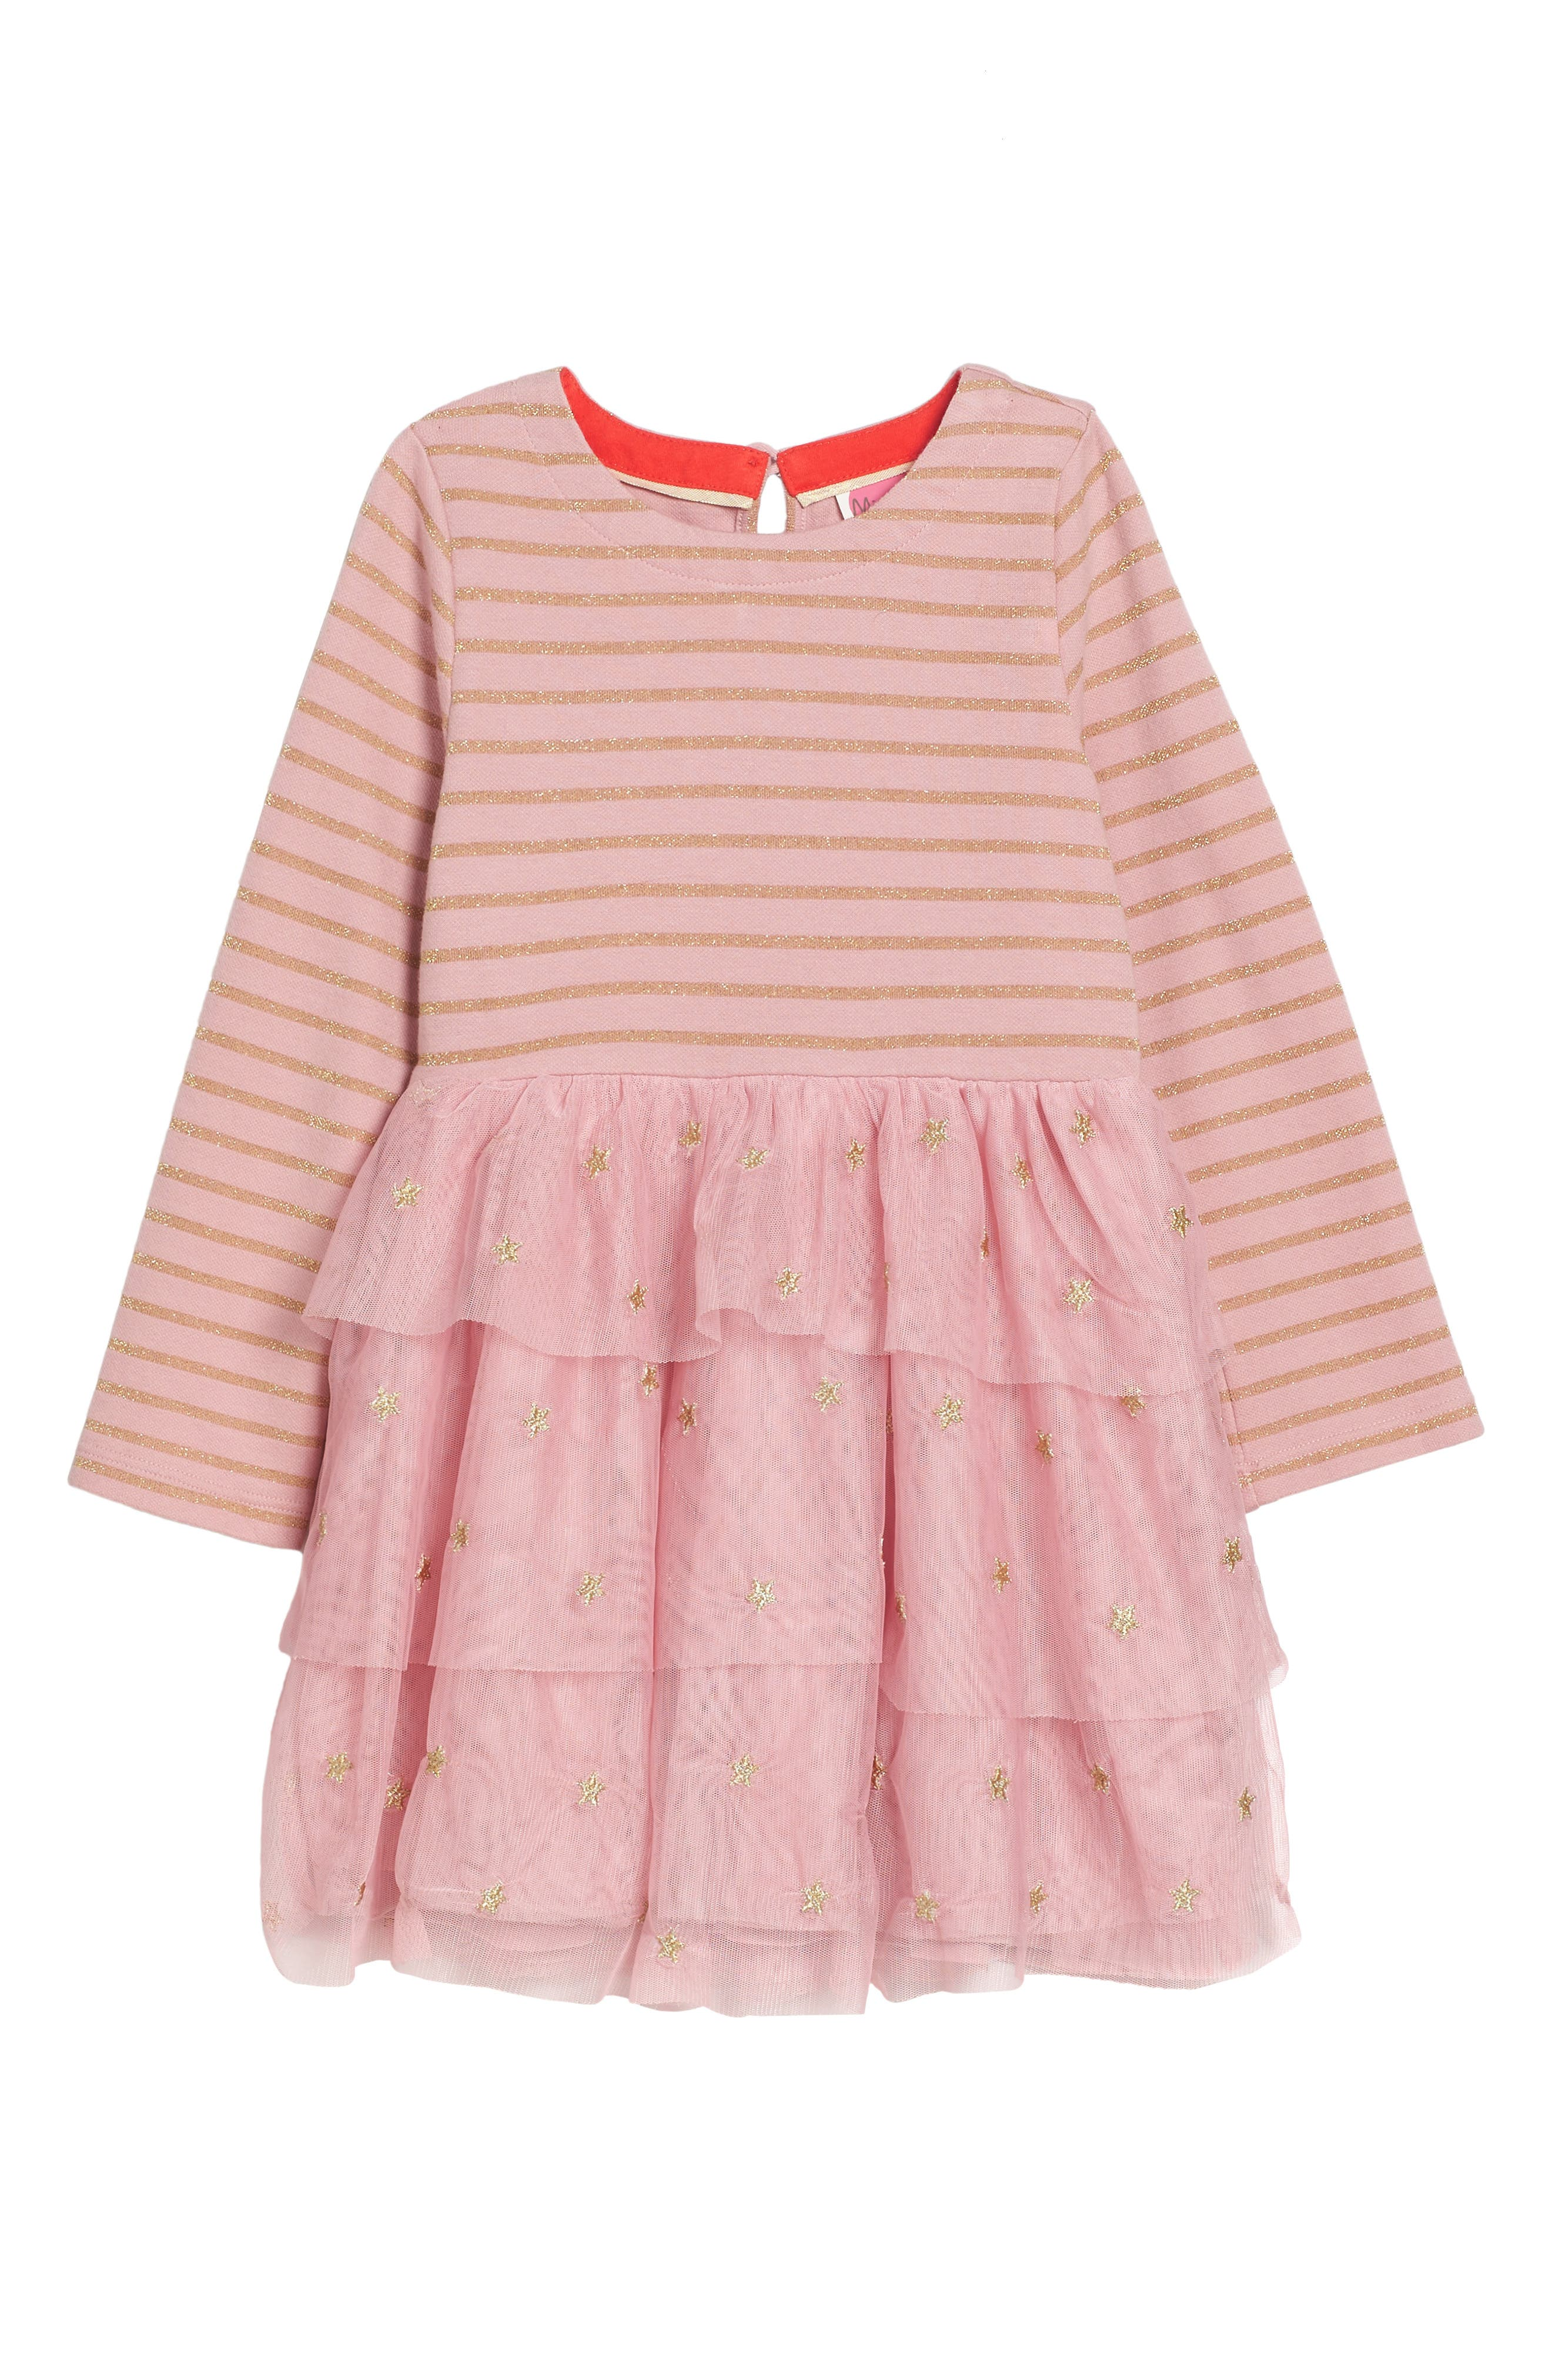 Mixed Media Dress,                         Main,                         color, 664